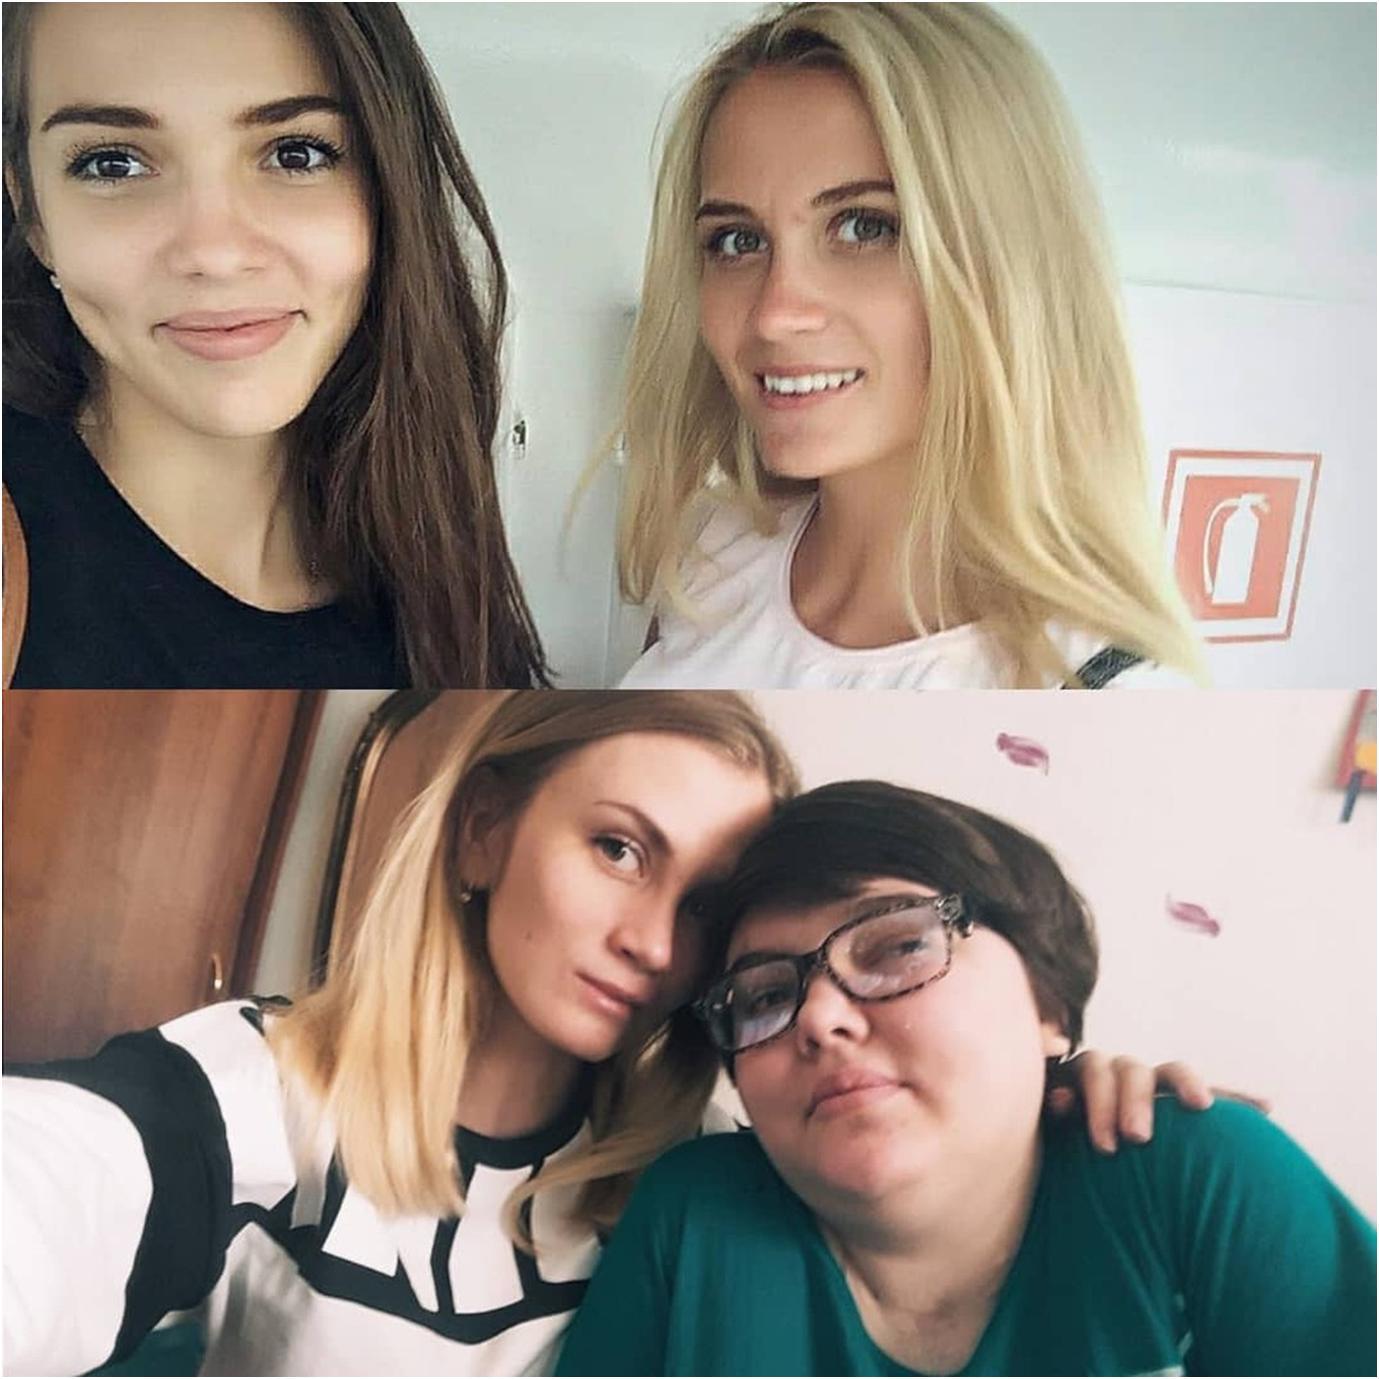 https://vlaad.ru/wp-content/uploads/2018/03/031518_0618_8.jpg